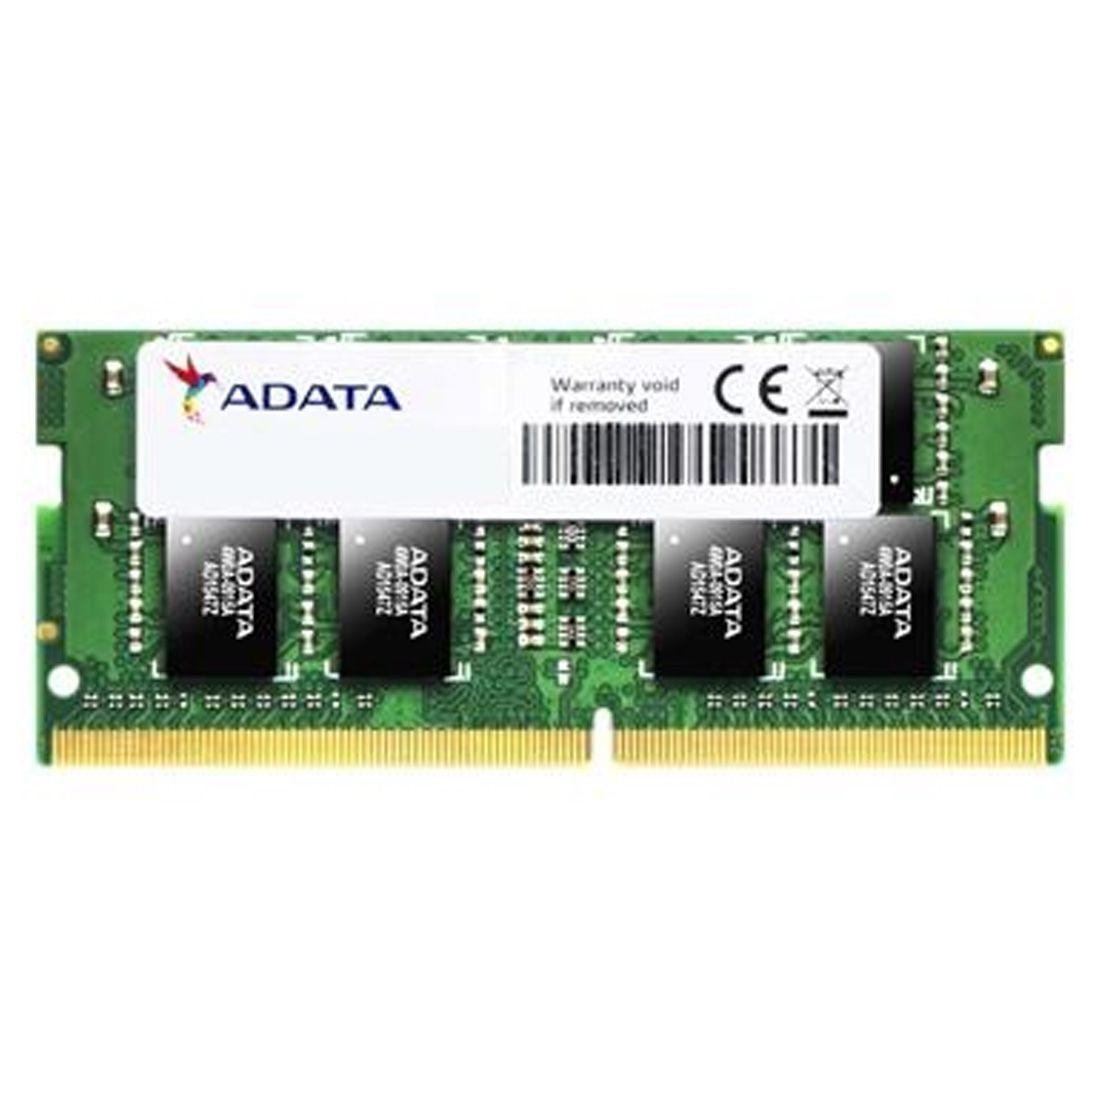 Memória RAM Adata P/ Notebook 16GB 2666MHz DDR4 SO-DIMM  Verde - AD4S2666716G19 - SNG